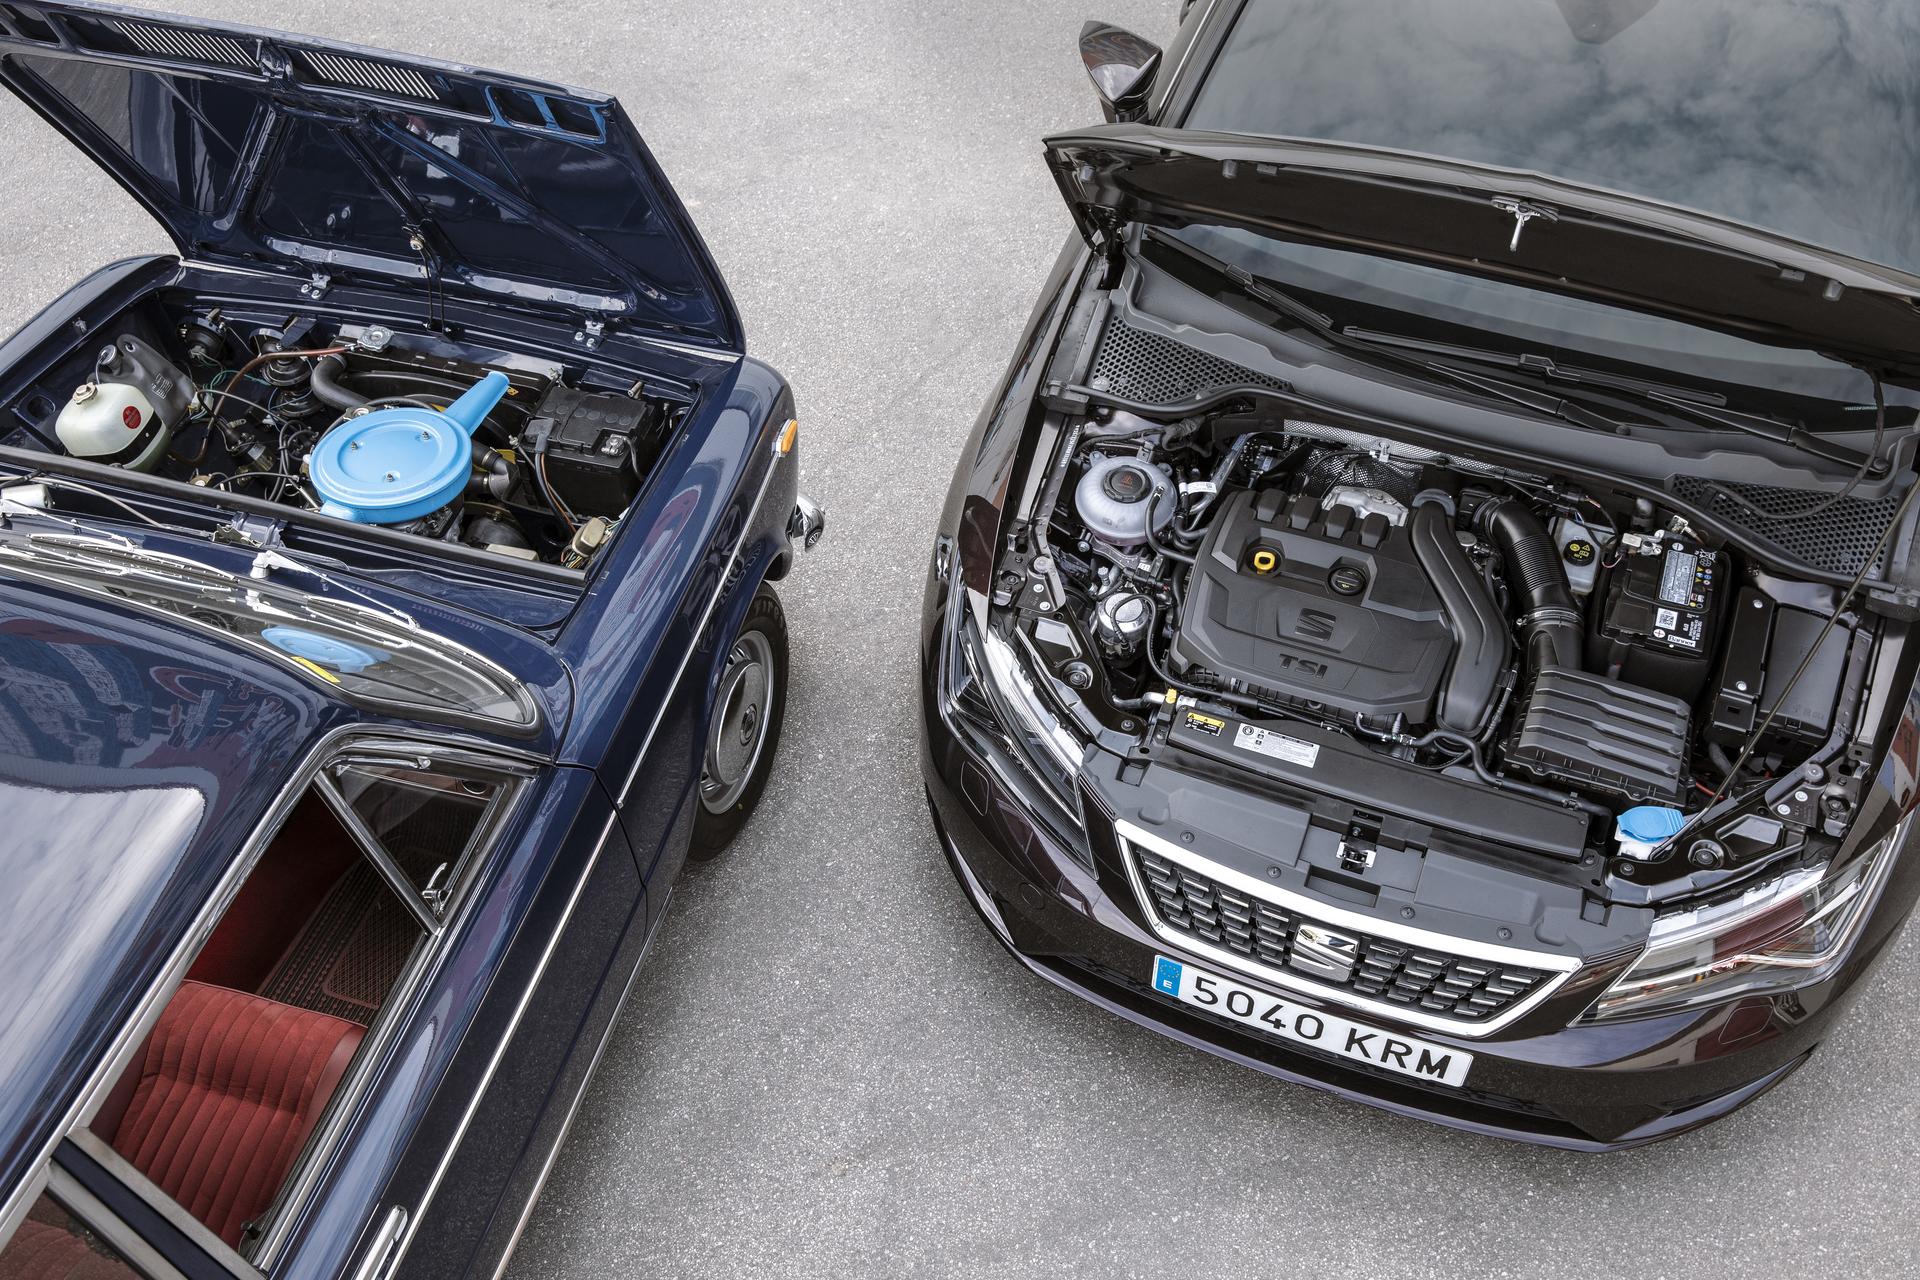 Seat Motores2